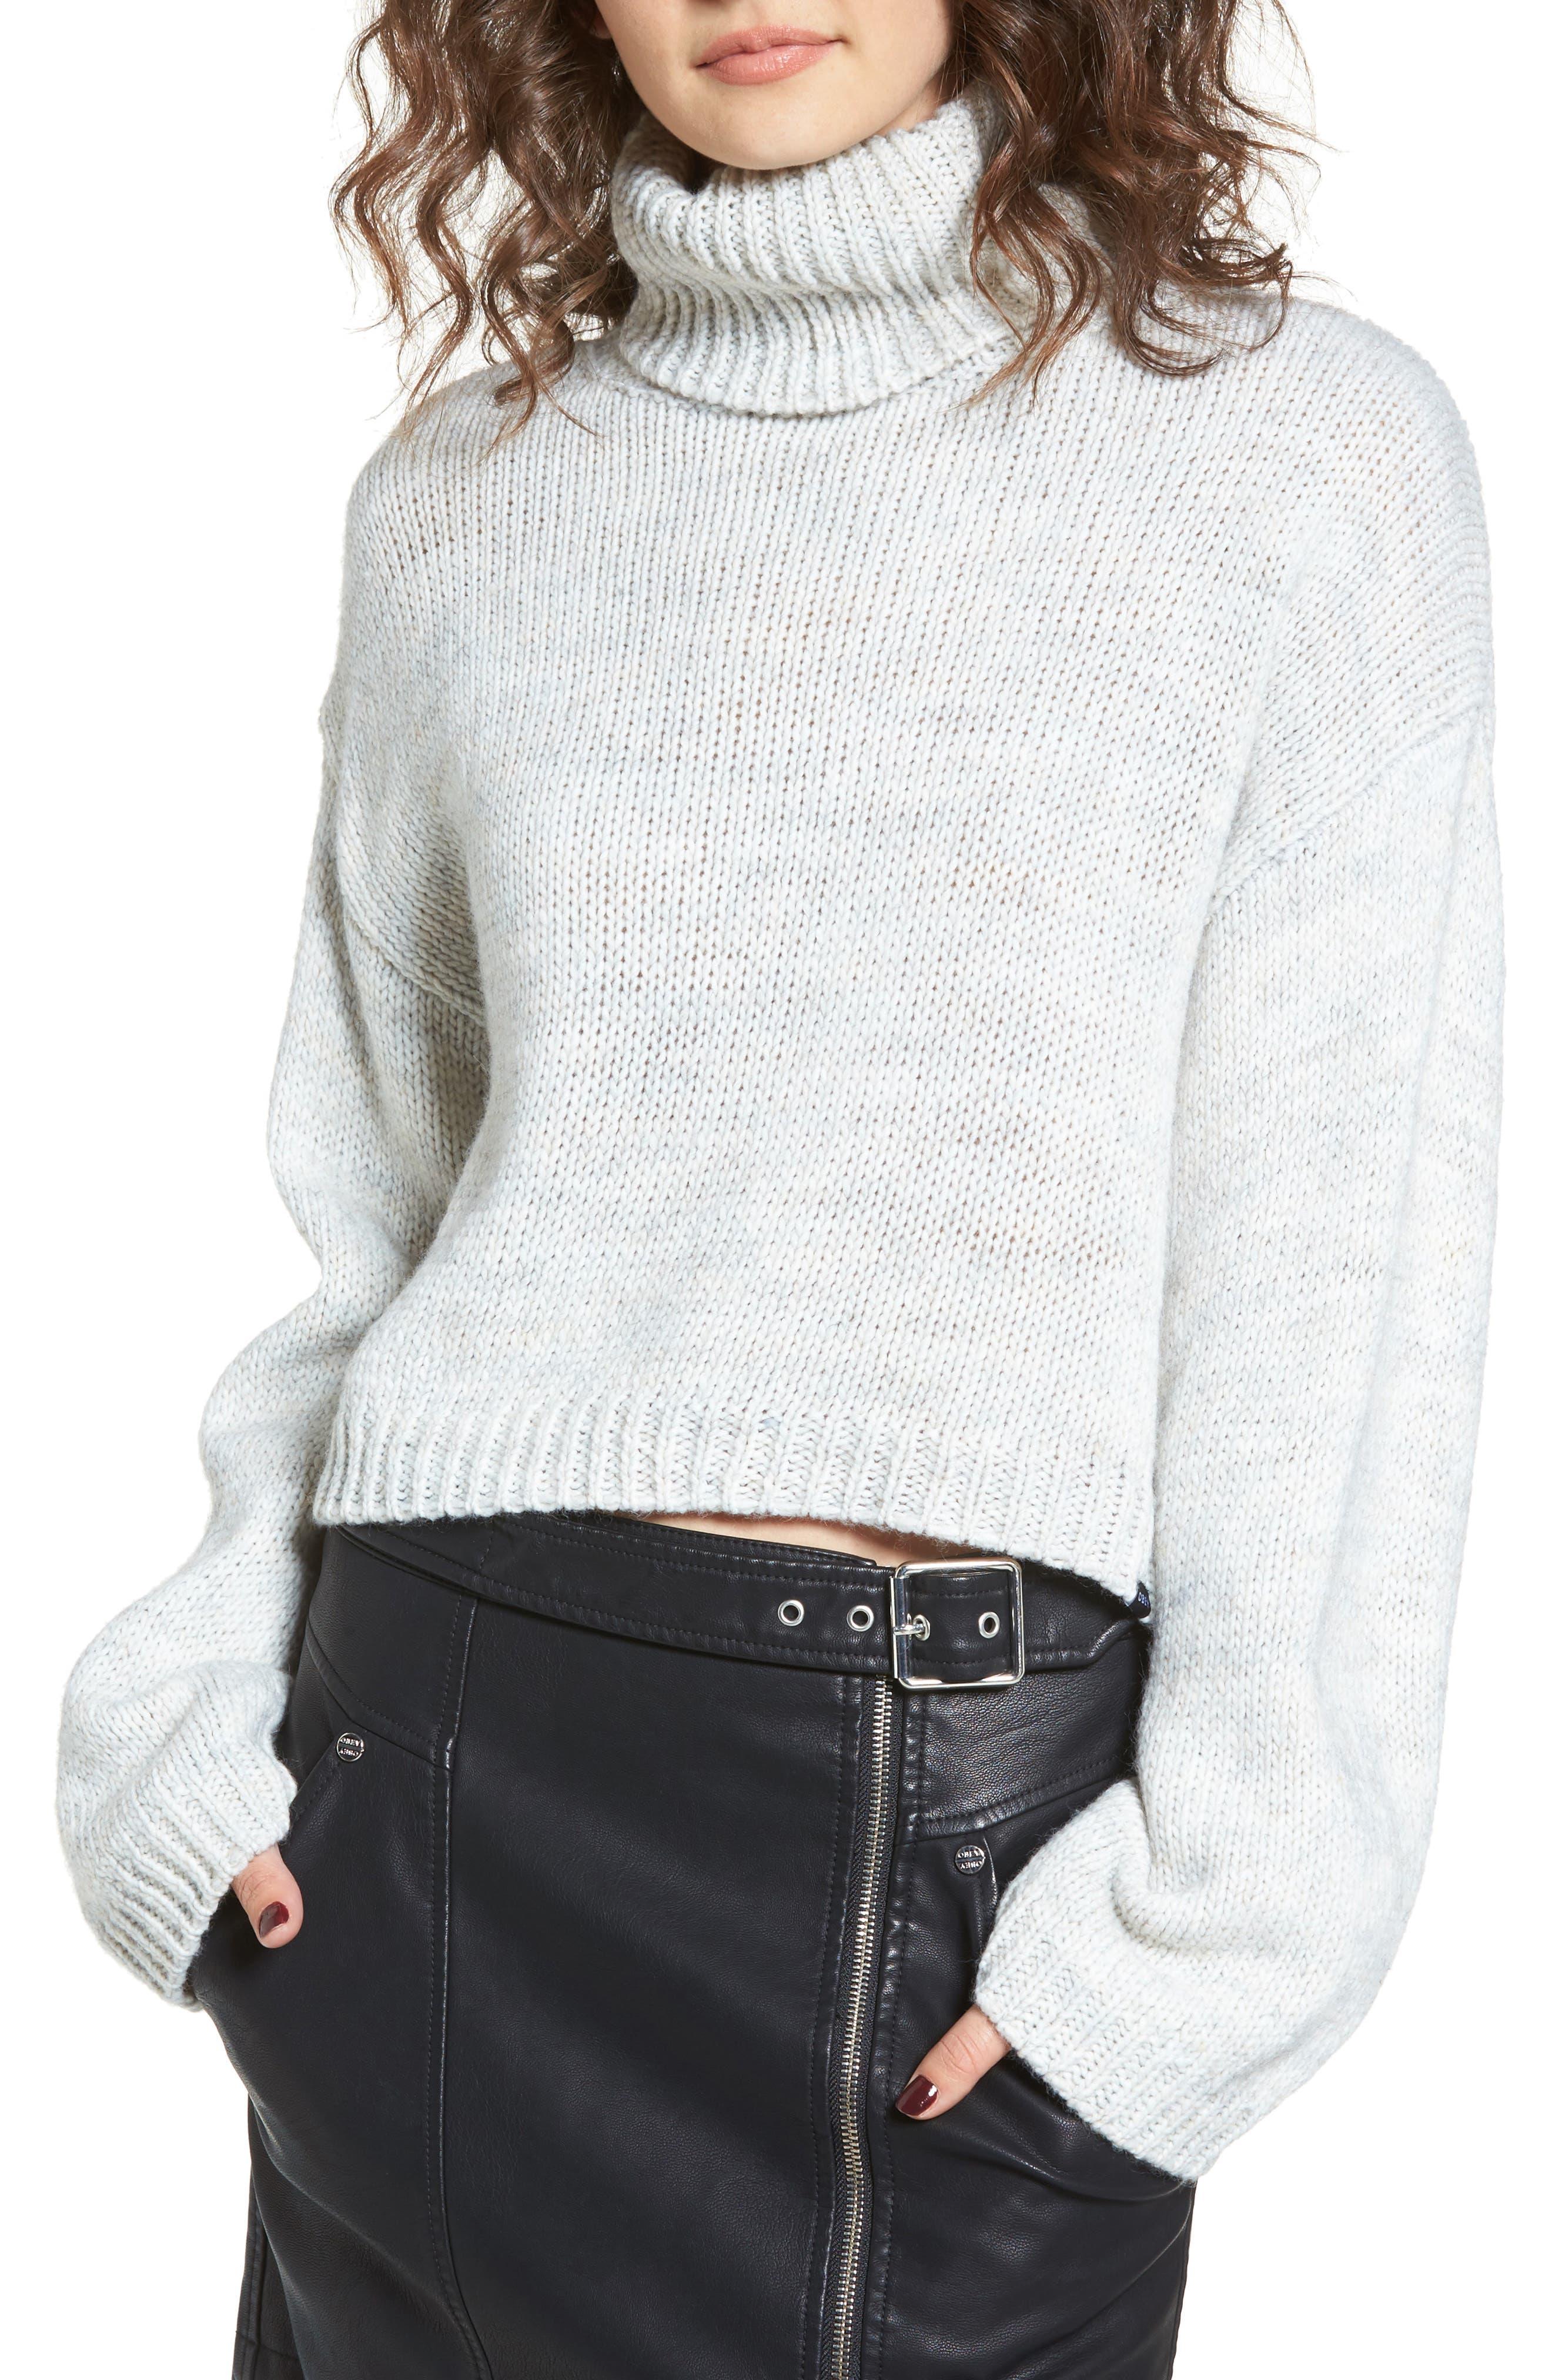 Skelter Turtleneck Sweater,                             Main thumbnail 1, color,                             Heather Grey